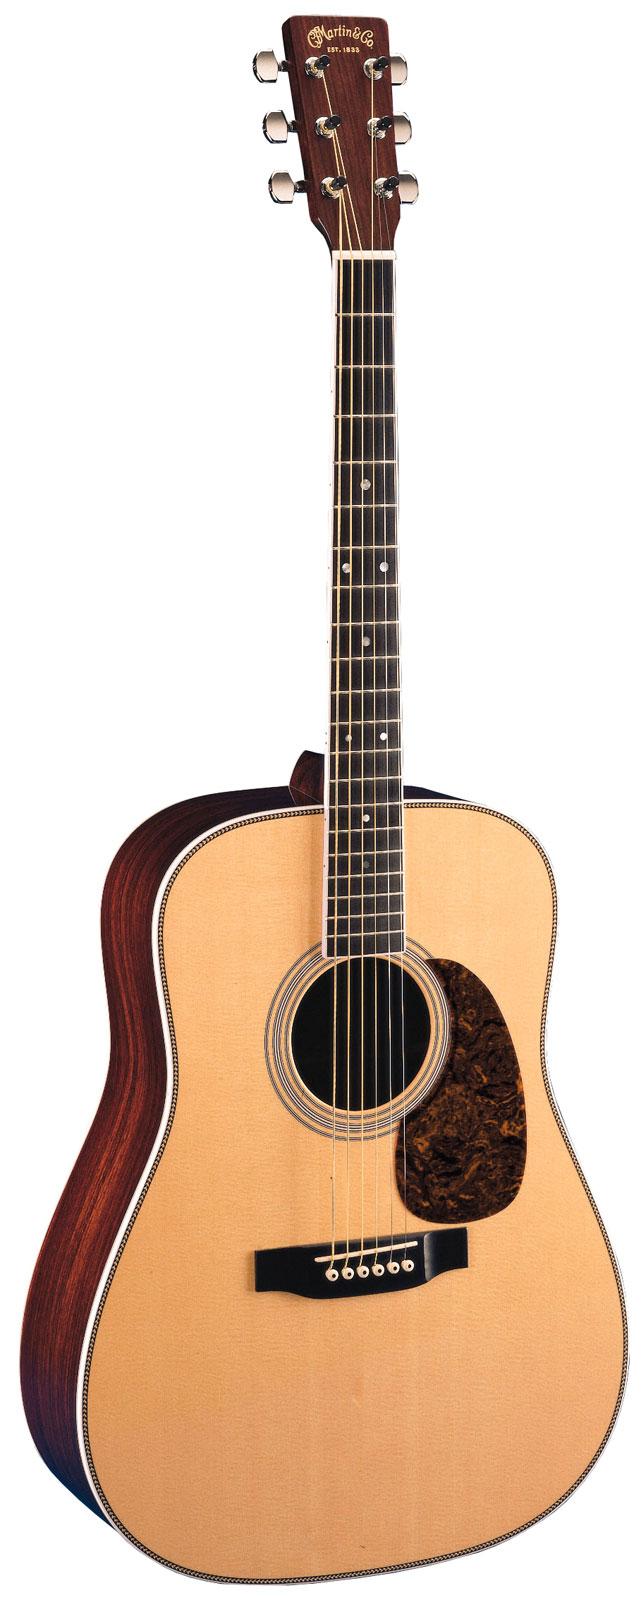 martin hd 35 acoustic guitar with case. Black Bedroom Furniture Sets. Home Design Ideas